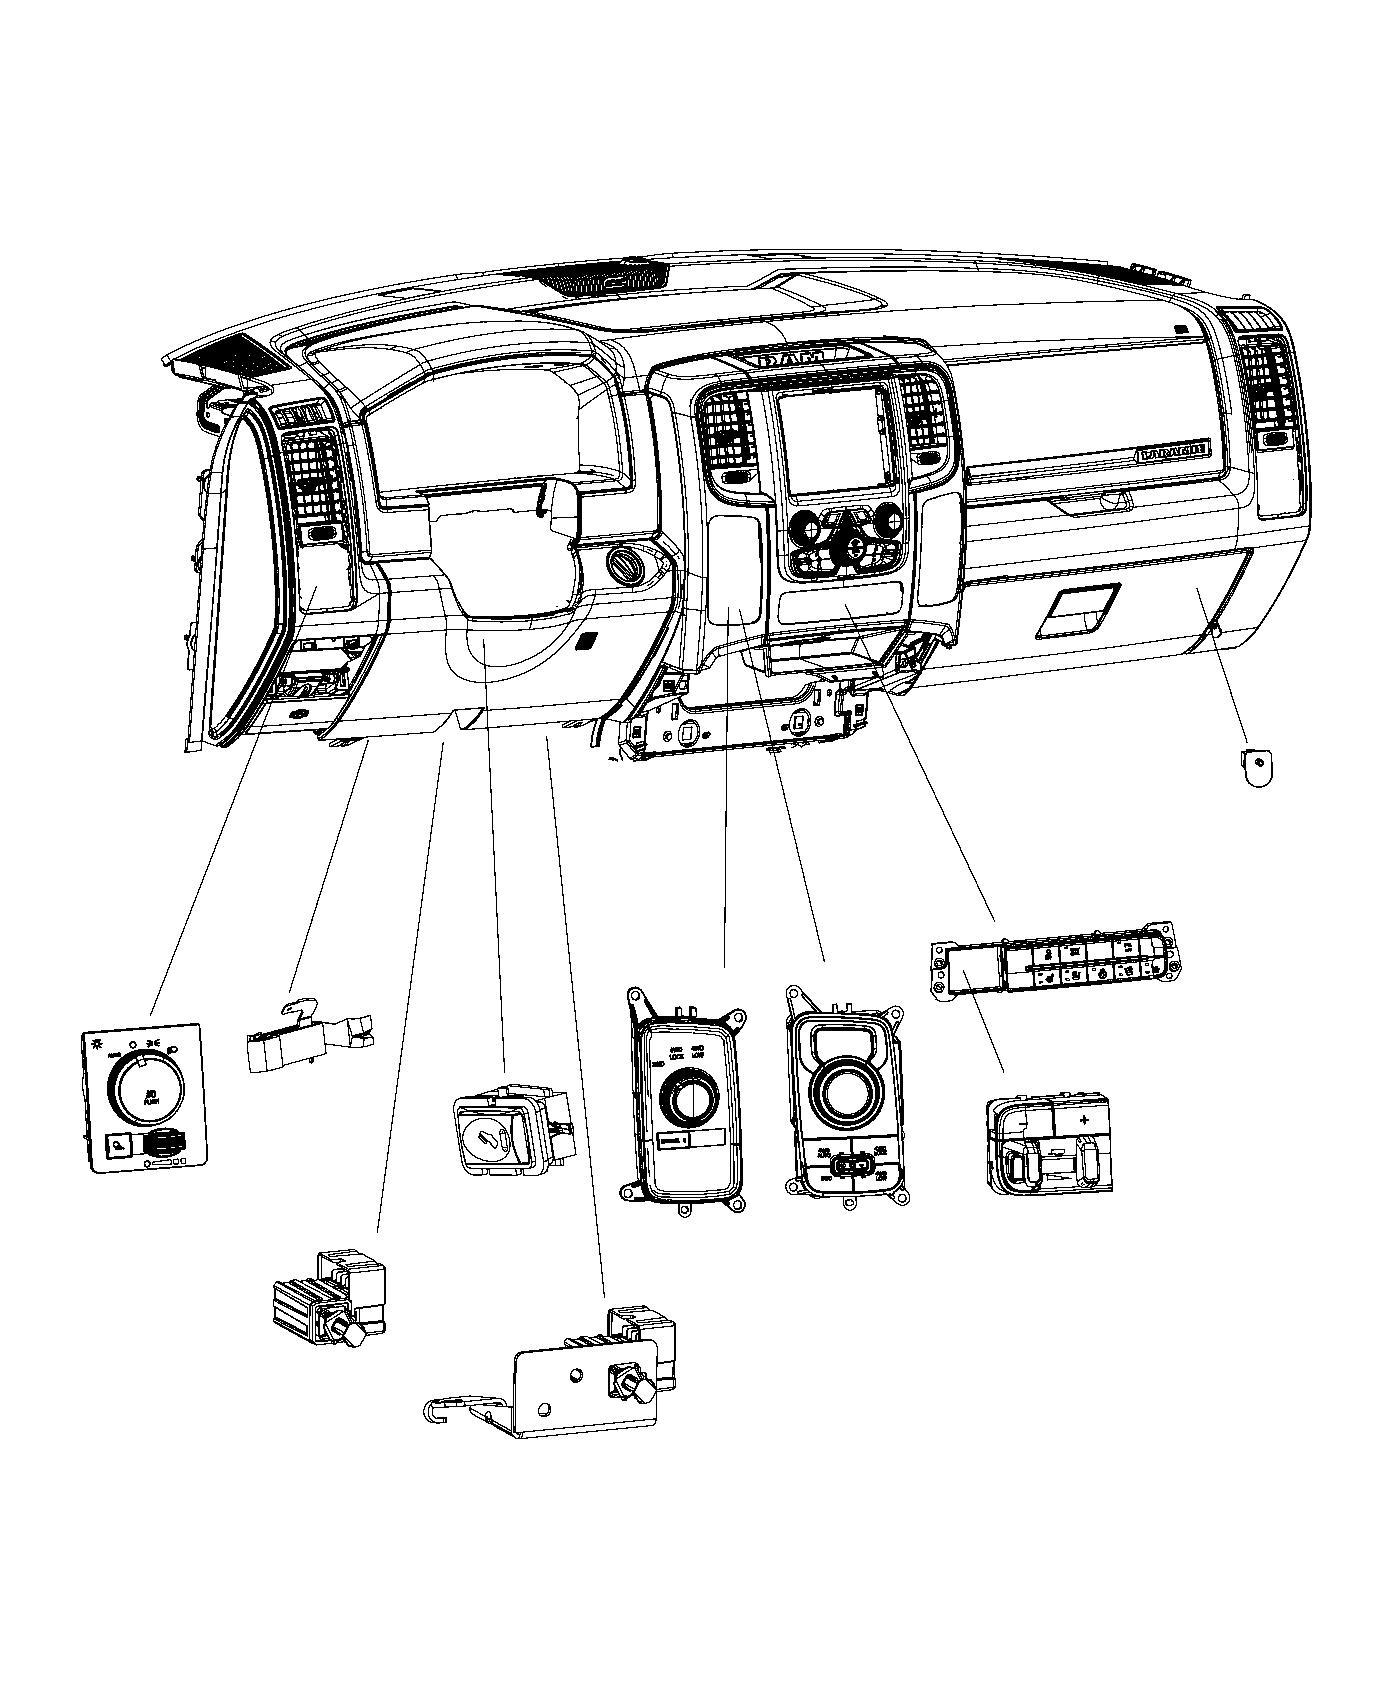 tags: #1998 volvo s70 alternator ac diagram#1998 volvo s70 dashboard wiring  diagram#wire diagram 99 volvo v70#2000 volvo s60 wiring diagram#2004 volvo  xc90